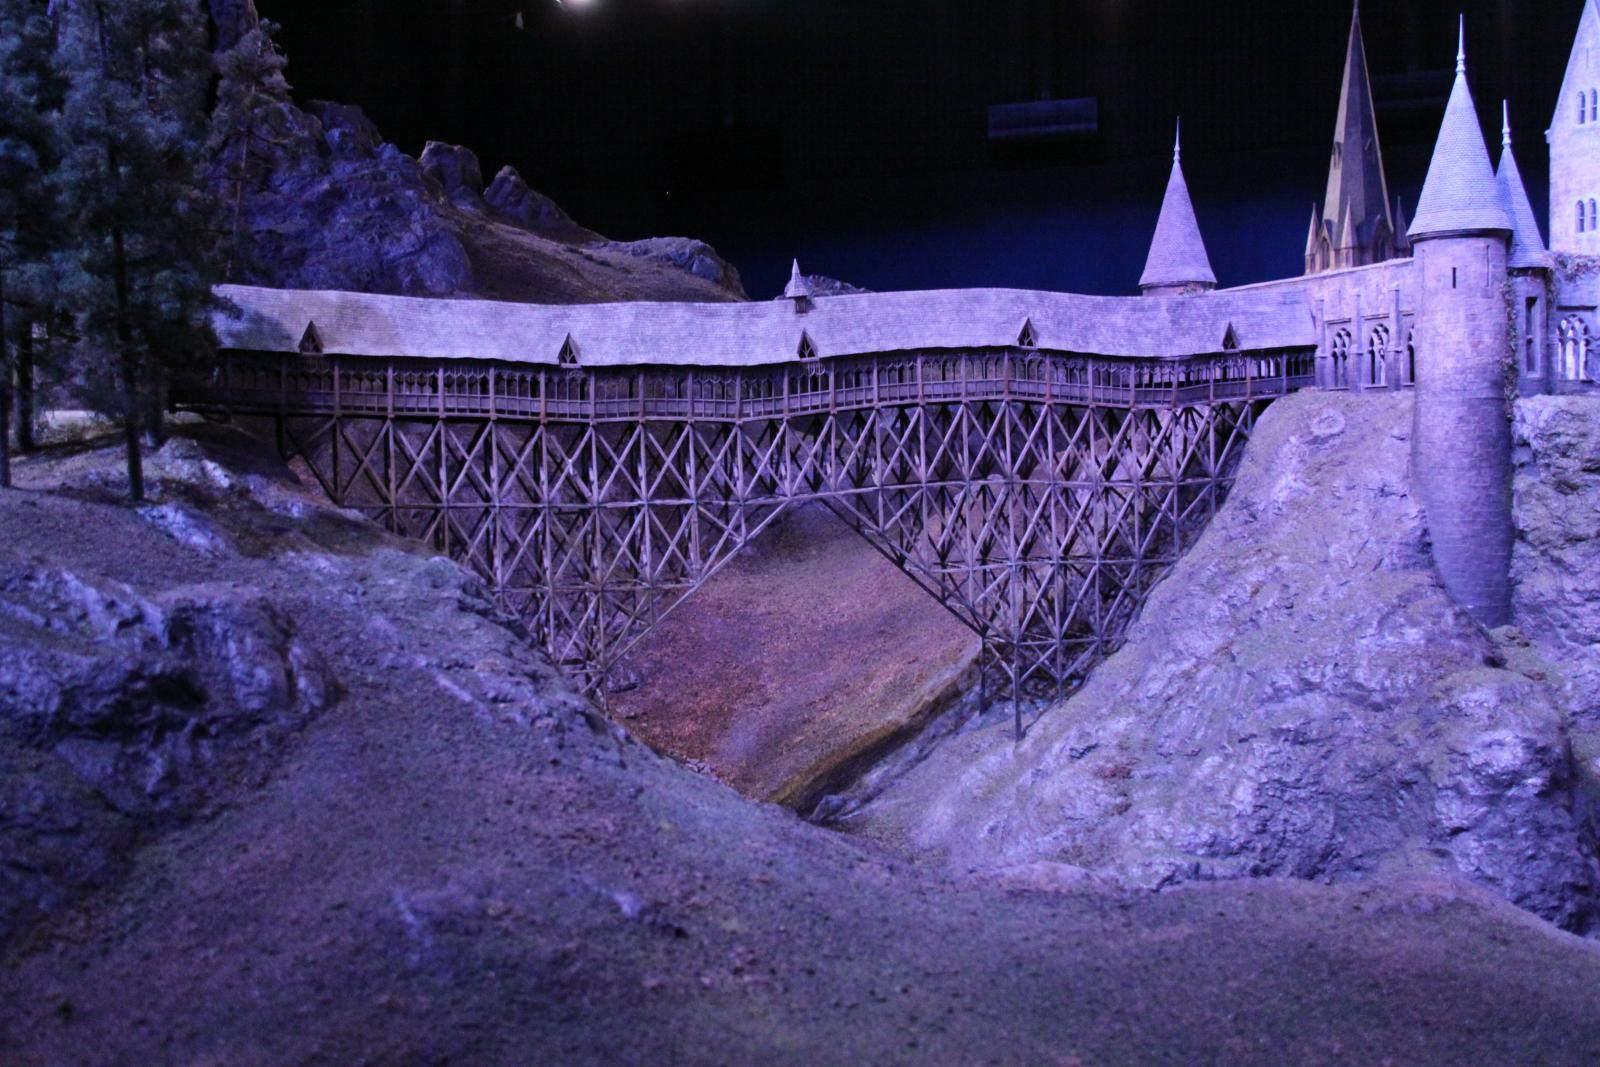 making harry potter6 The Making of Harry Potter, Warner Bros Studio London